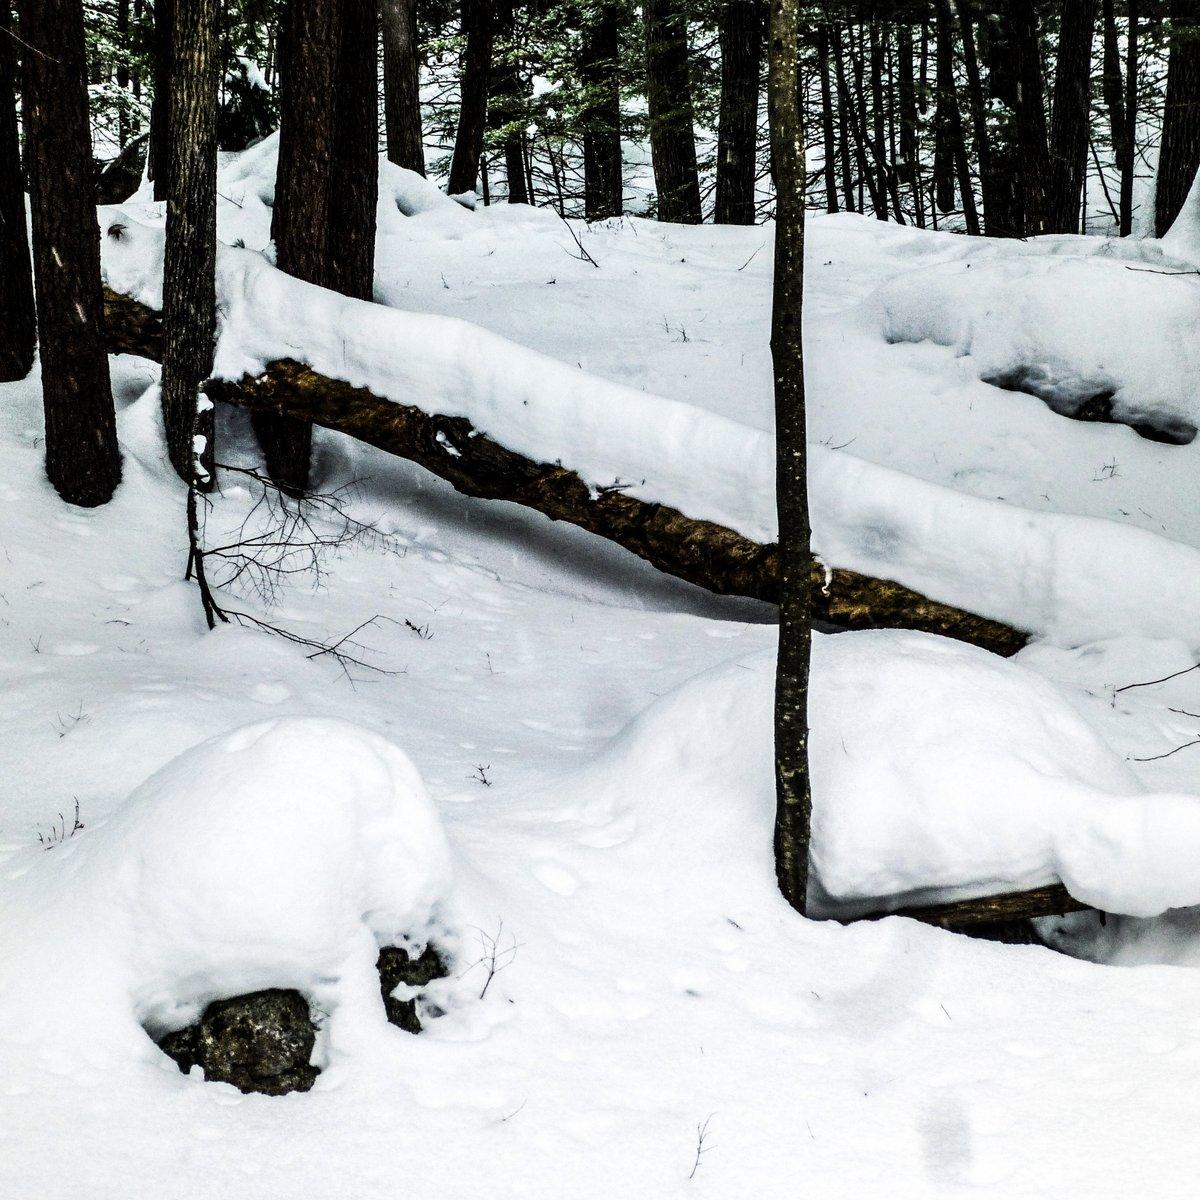 7. Snow Depth